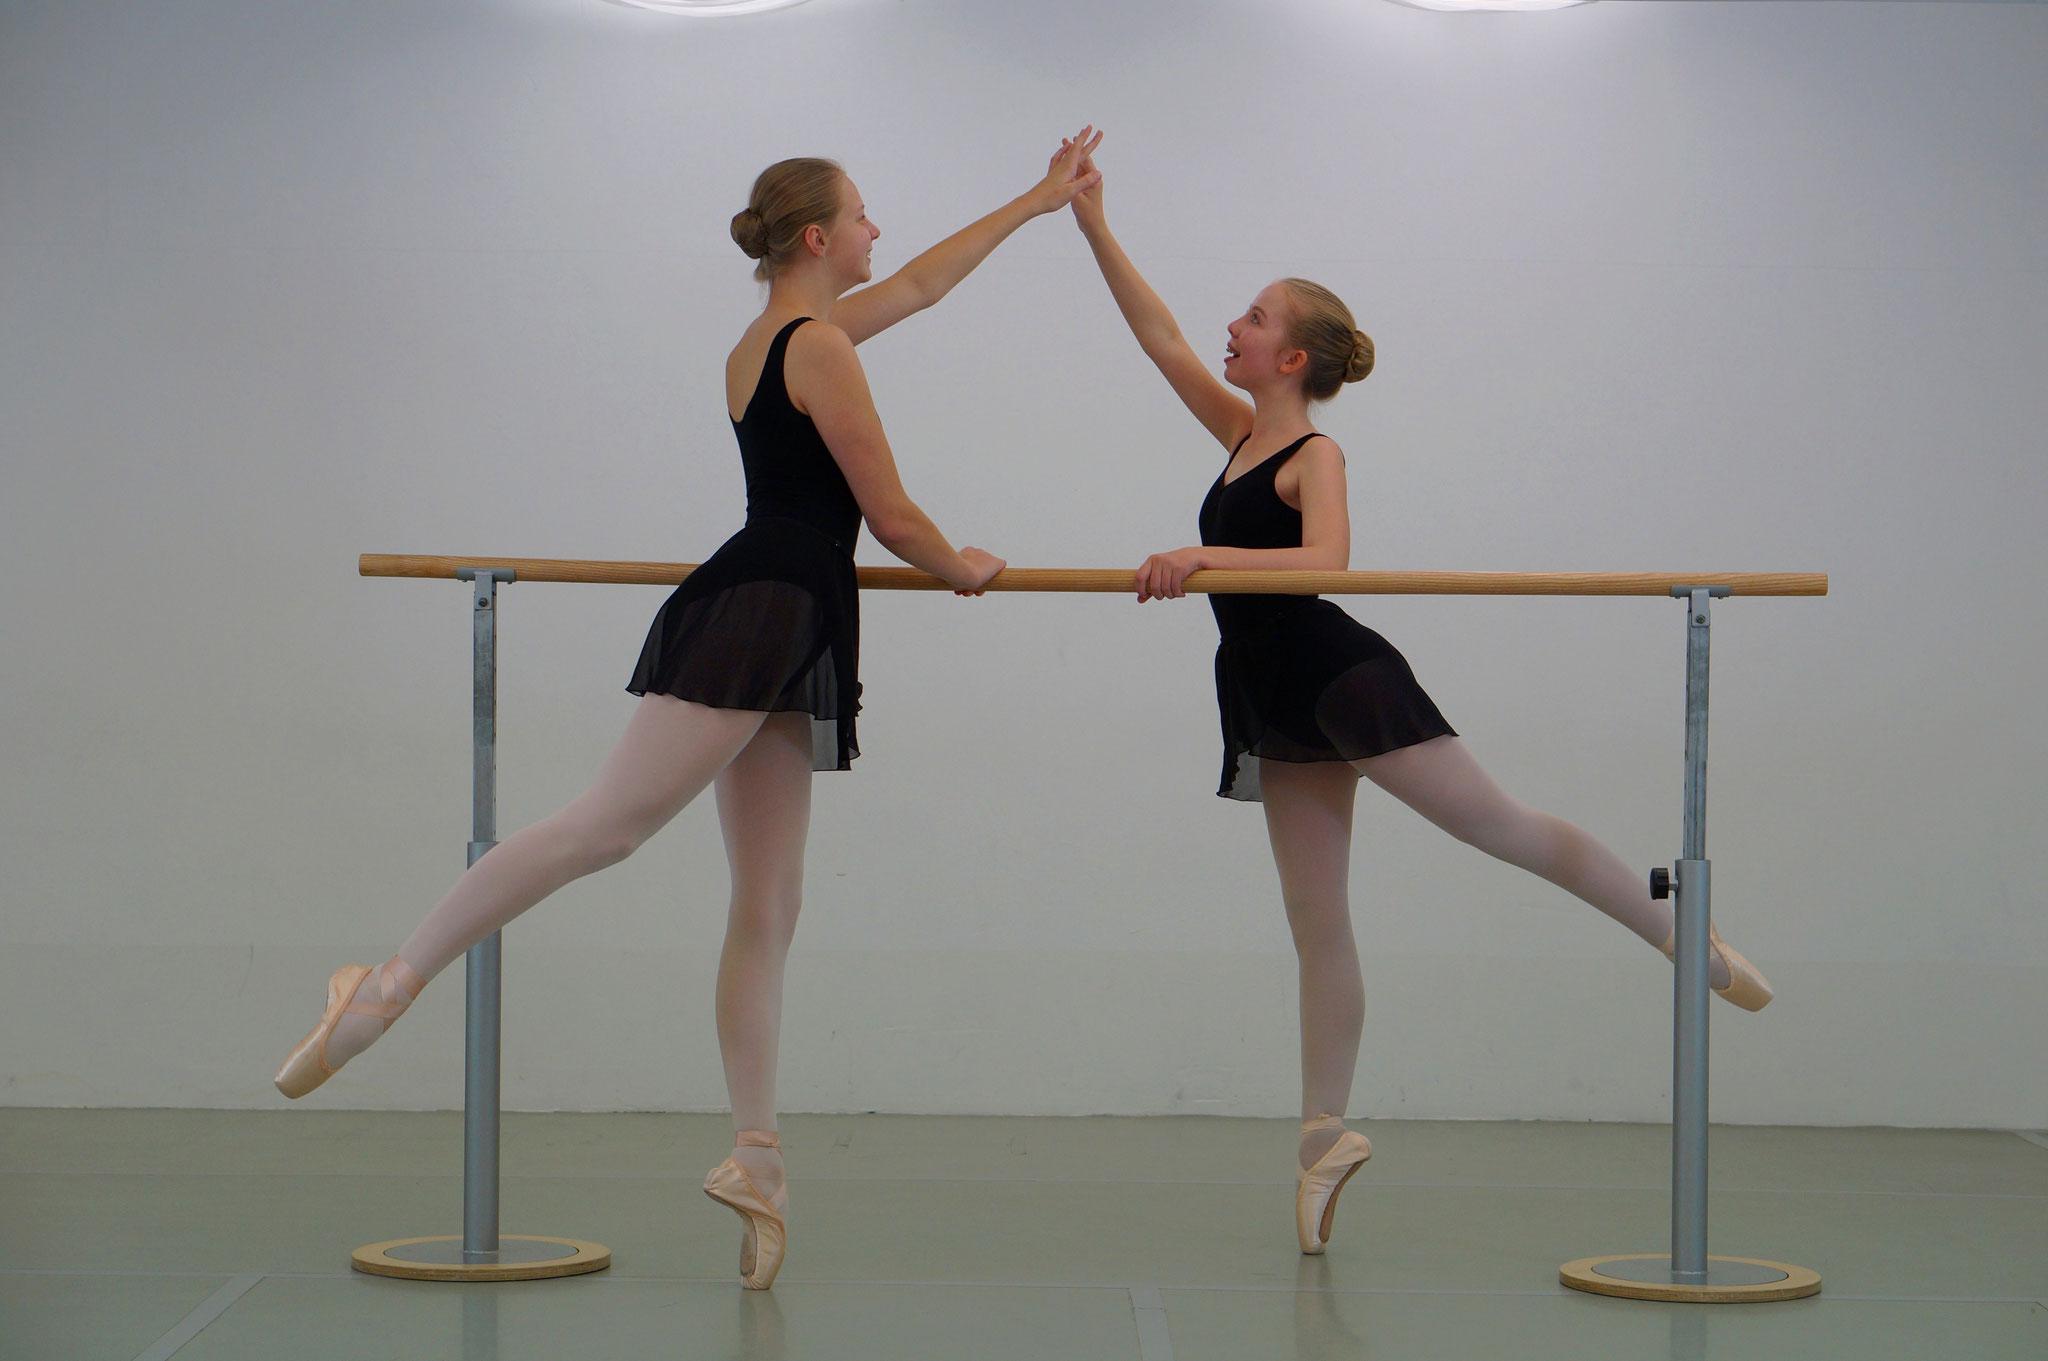 Im Ballettsaal - Fotoshooting 2017 in der Ballettschule Lorbeer